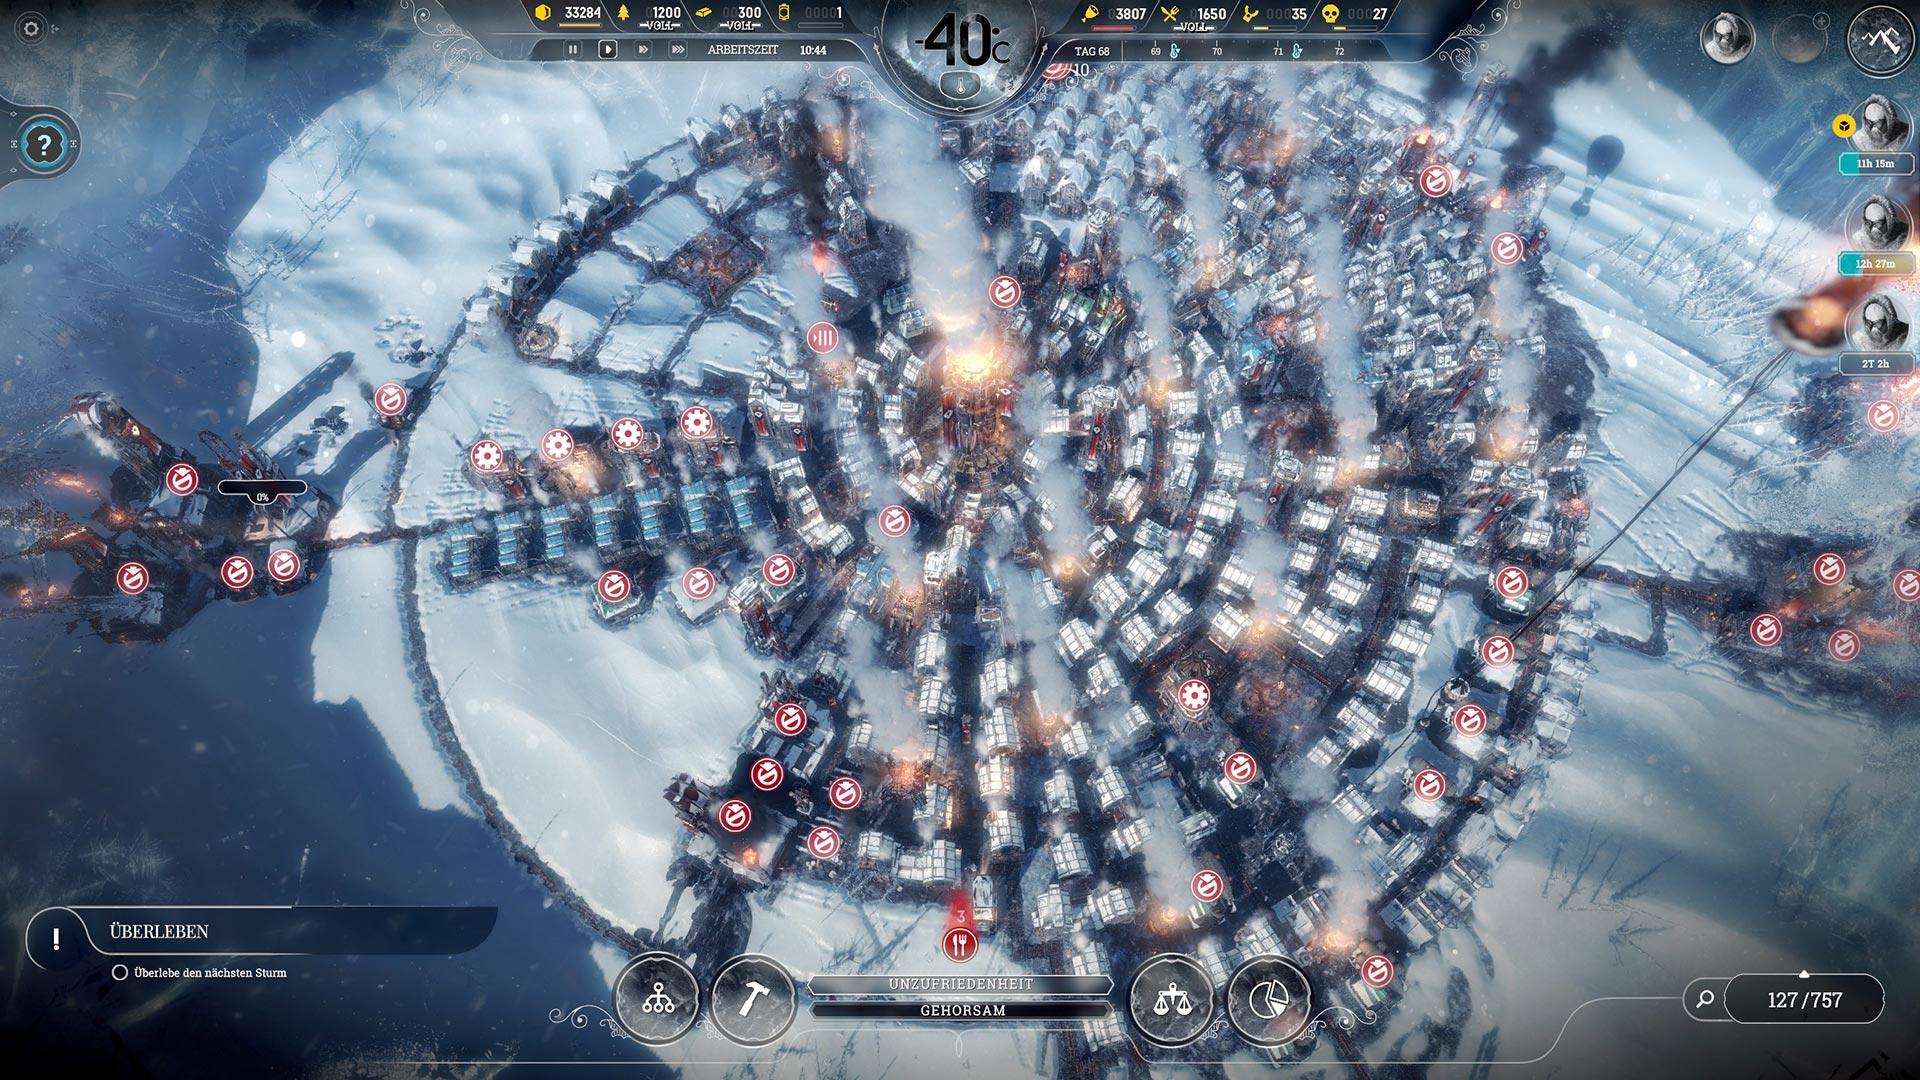 Frostpunk - Große Kolonie im Endlosmodus